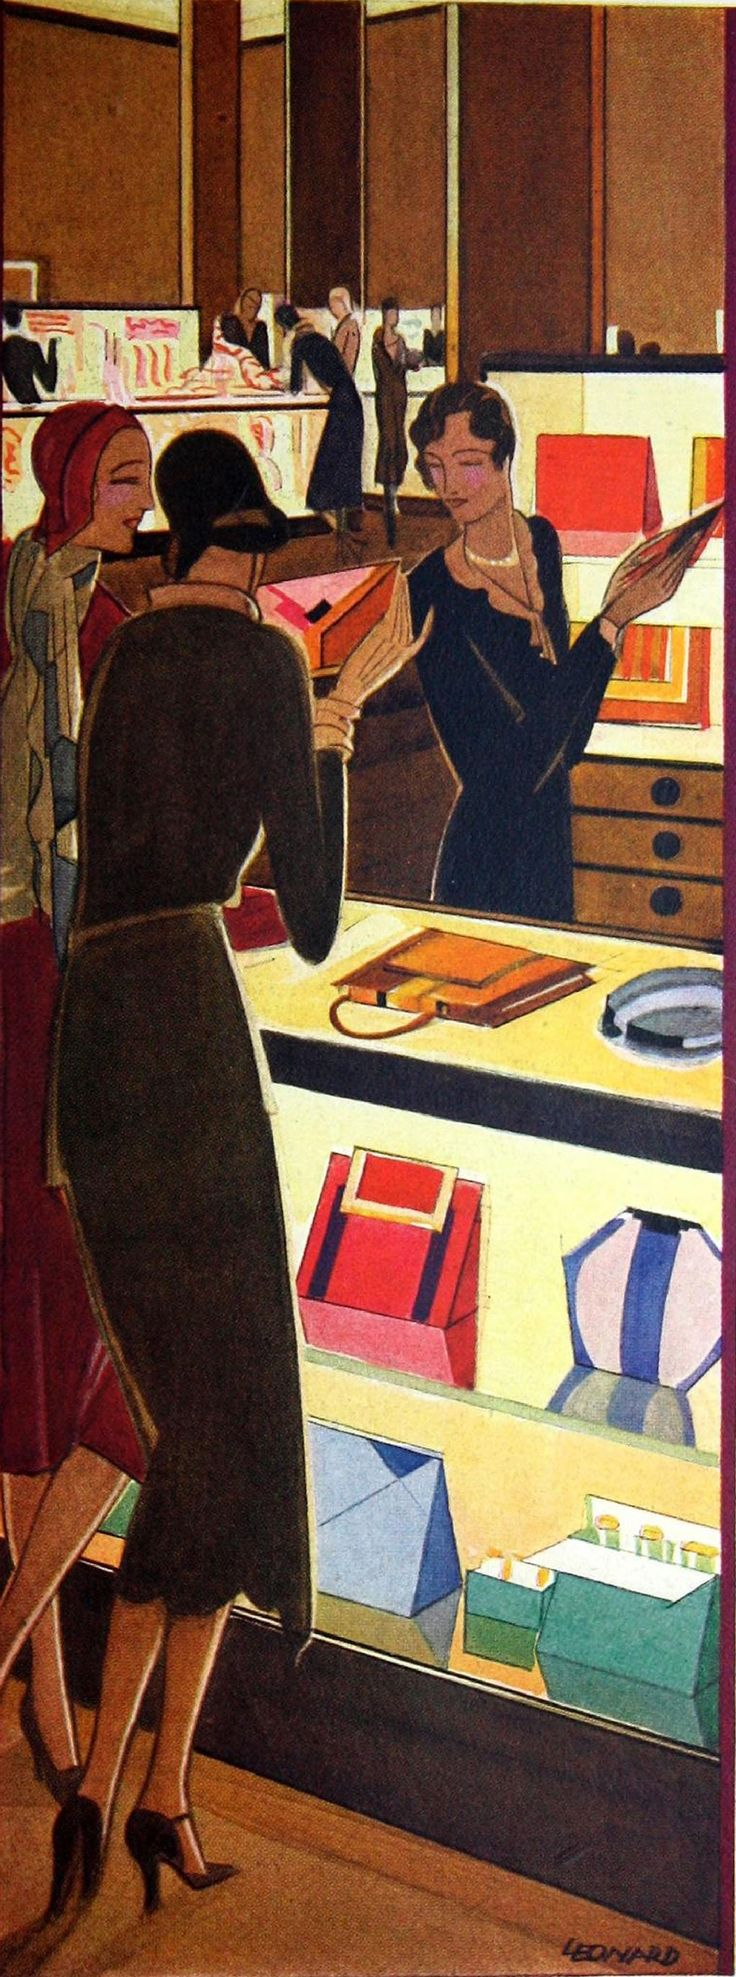 Leonard - Art Deco Illustration from vintage DuPont catalogue